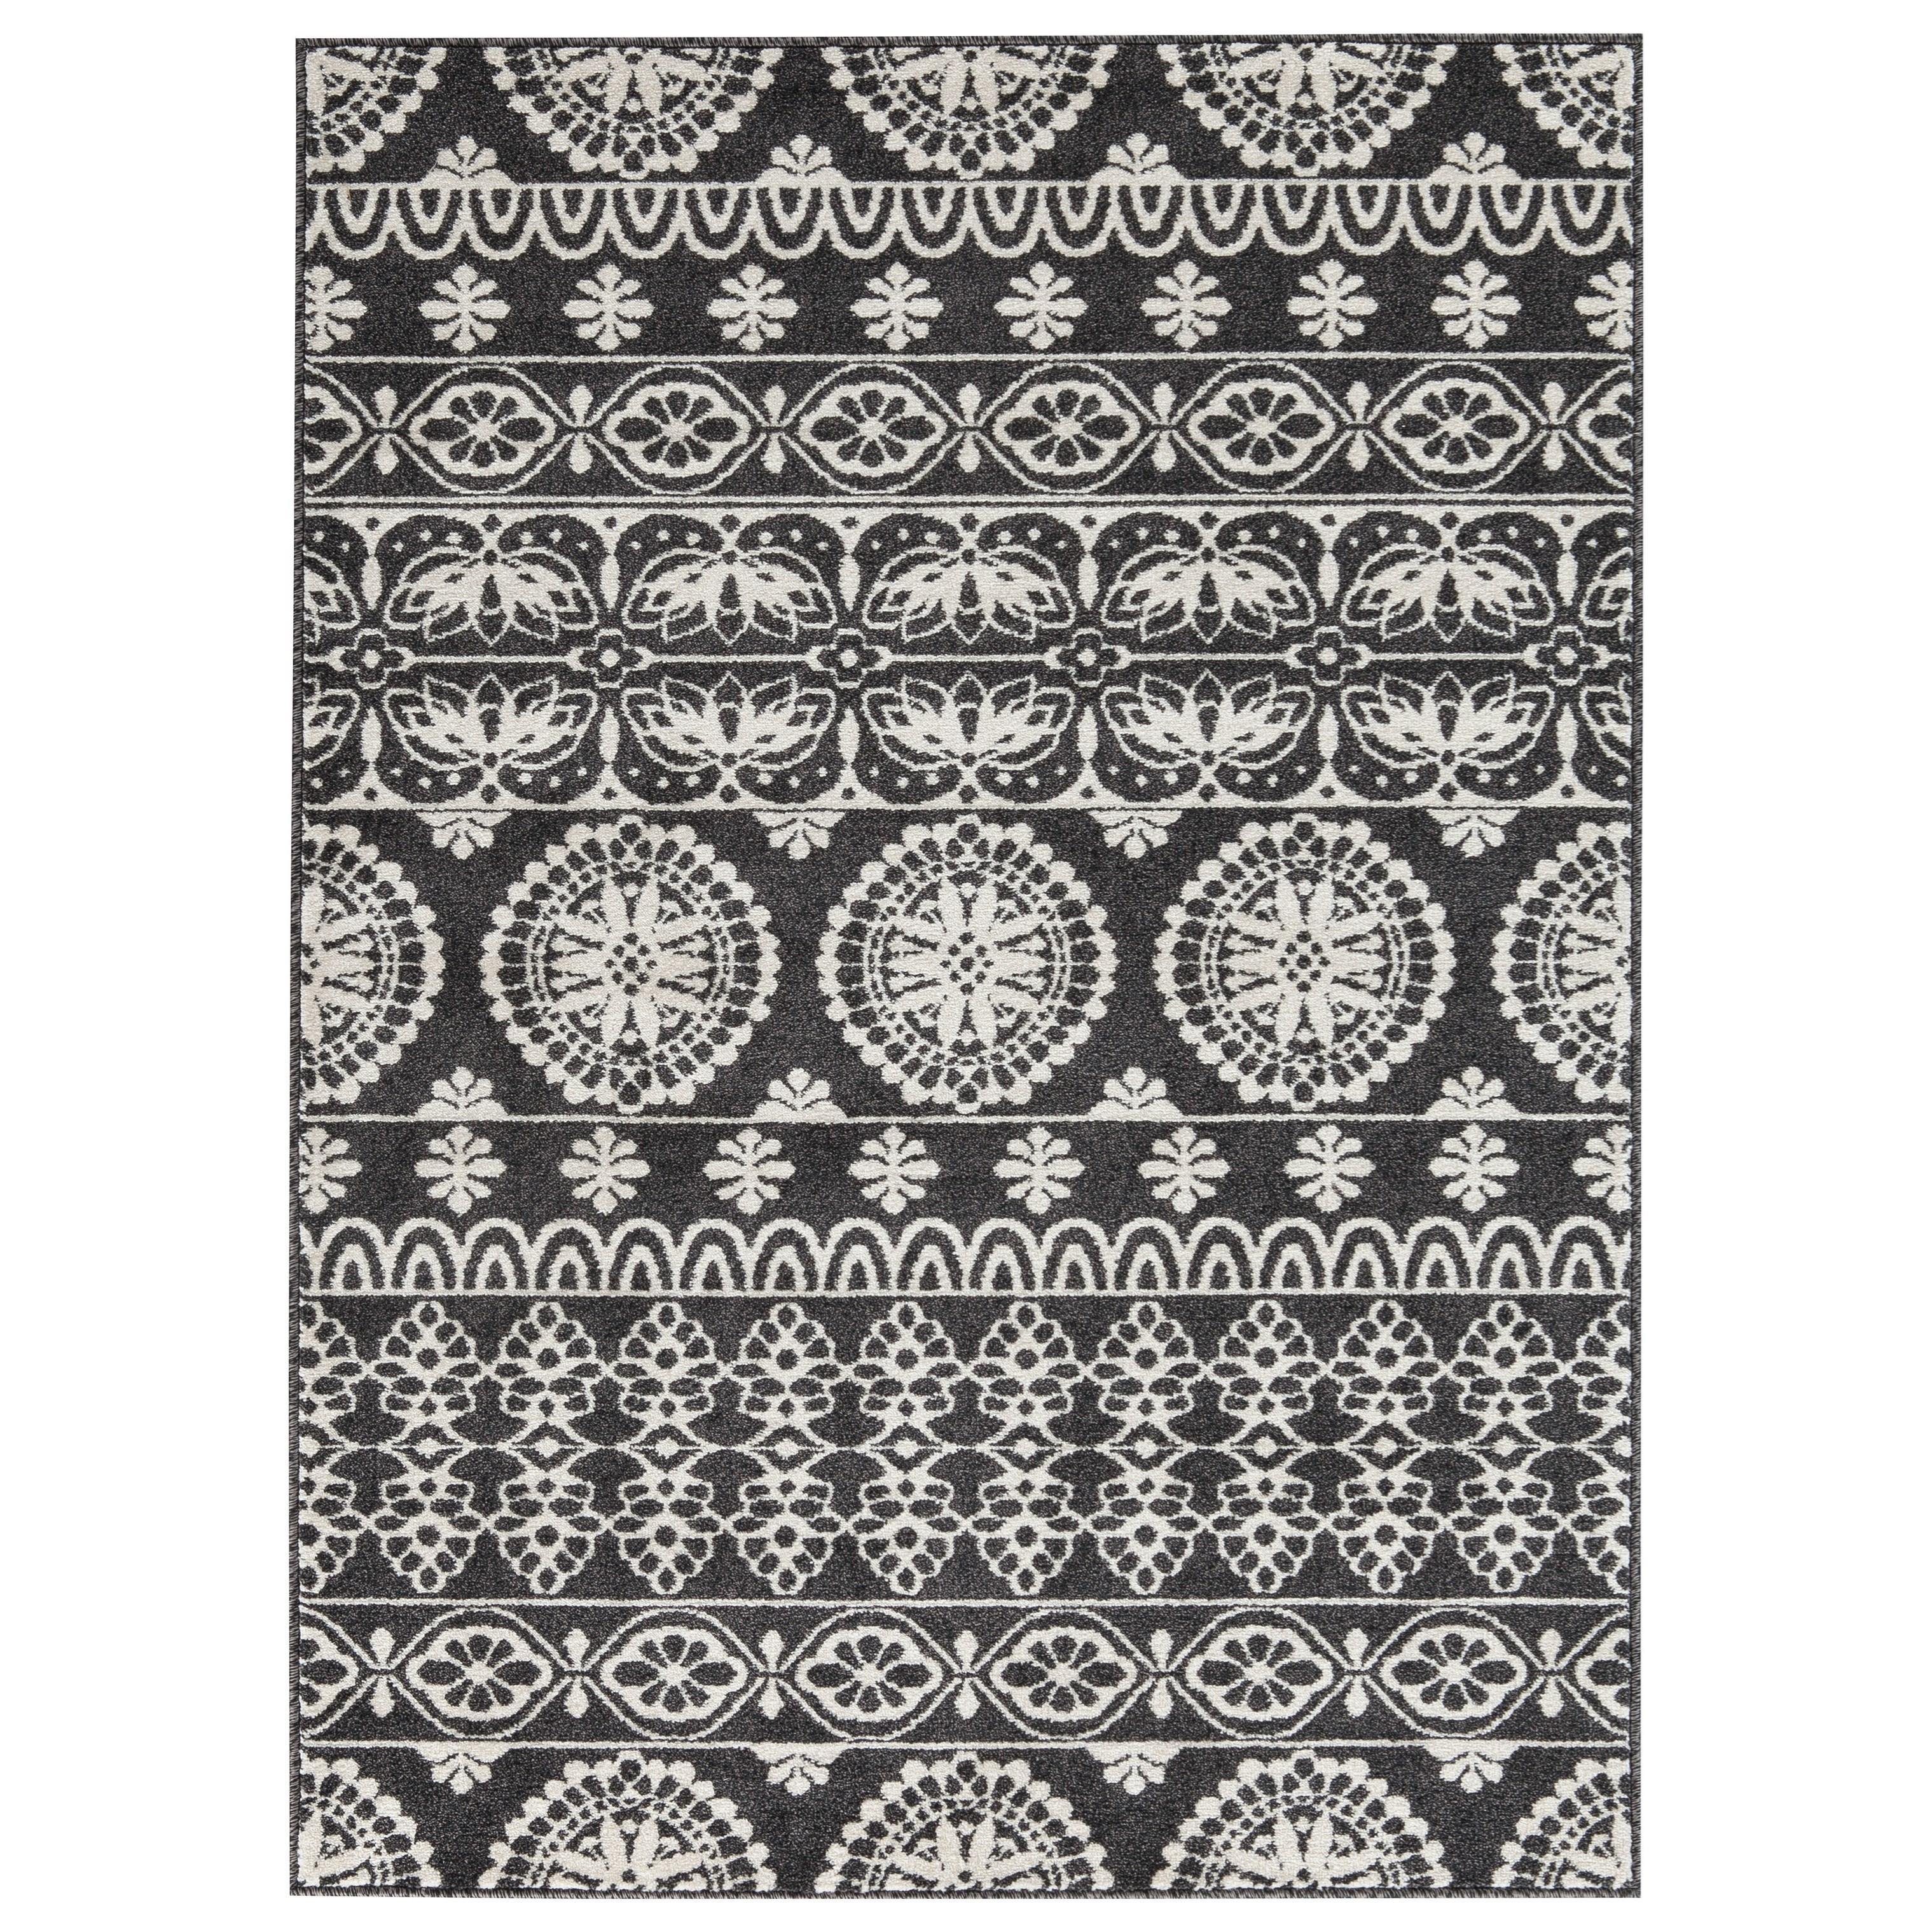 Transitional Area Rugs Jicarilla Black/White Medium Rug by Signature at Walker's Furniture